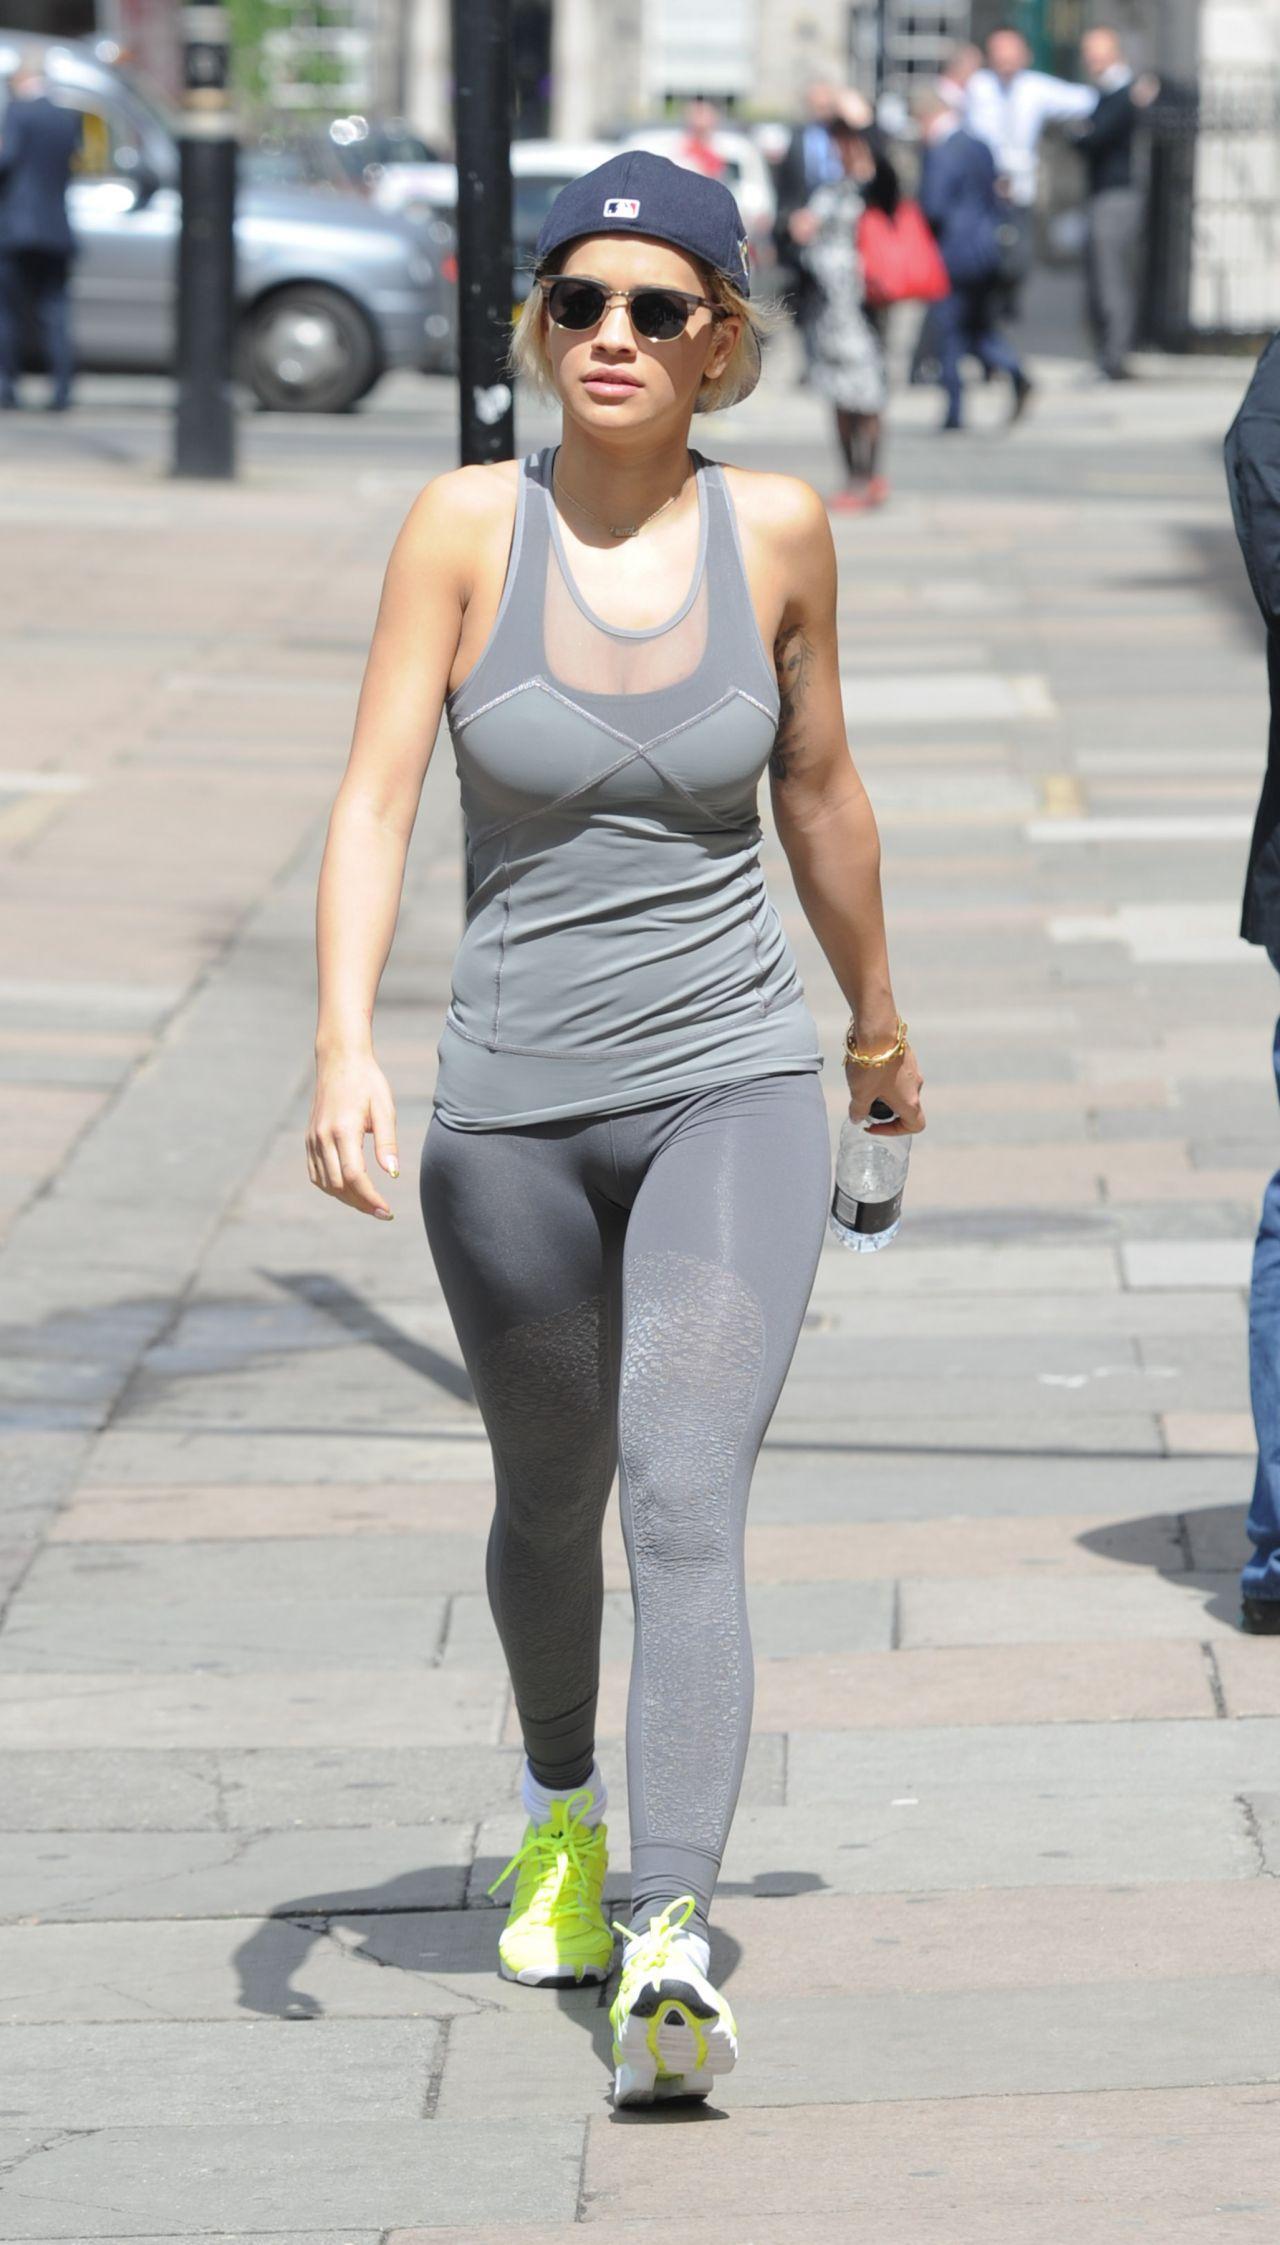 Rita Ora In Tights At A Gym In London - May 2014-4828